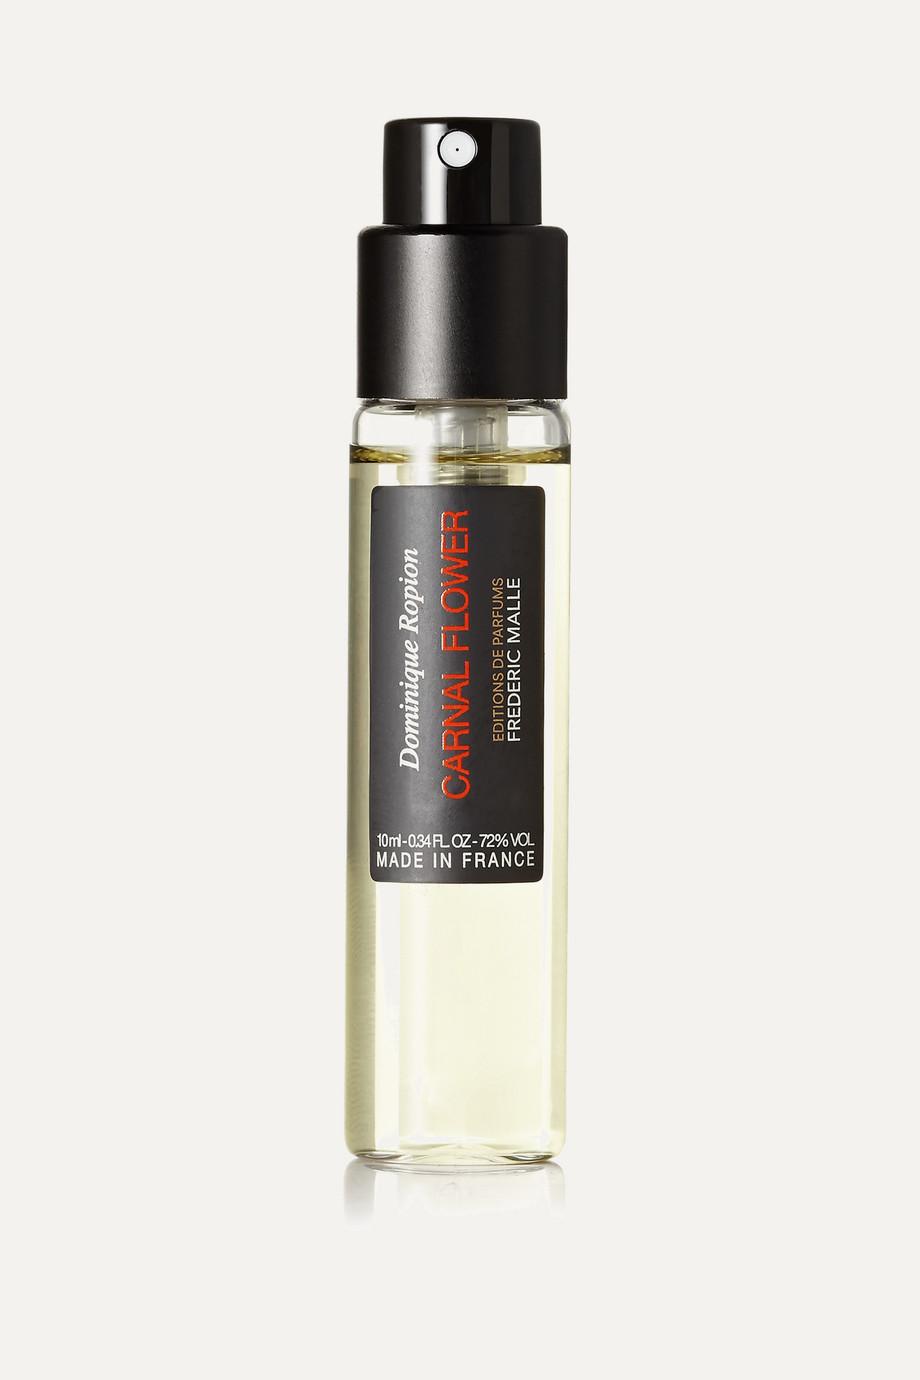 Frederic Malle Carnal Flower Eau de Parfum - Green Notes & Tuberose Absolute, 10ml